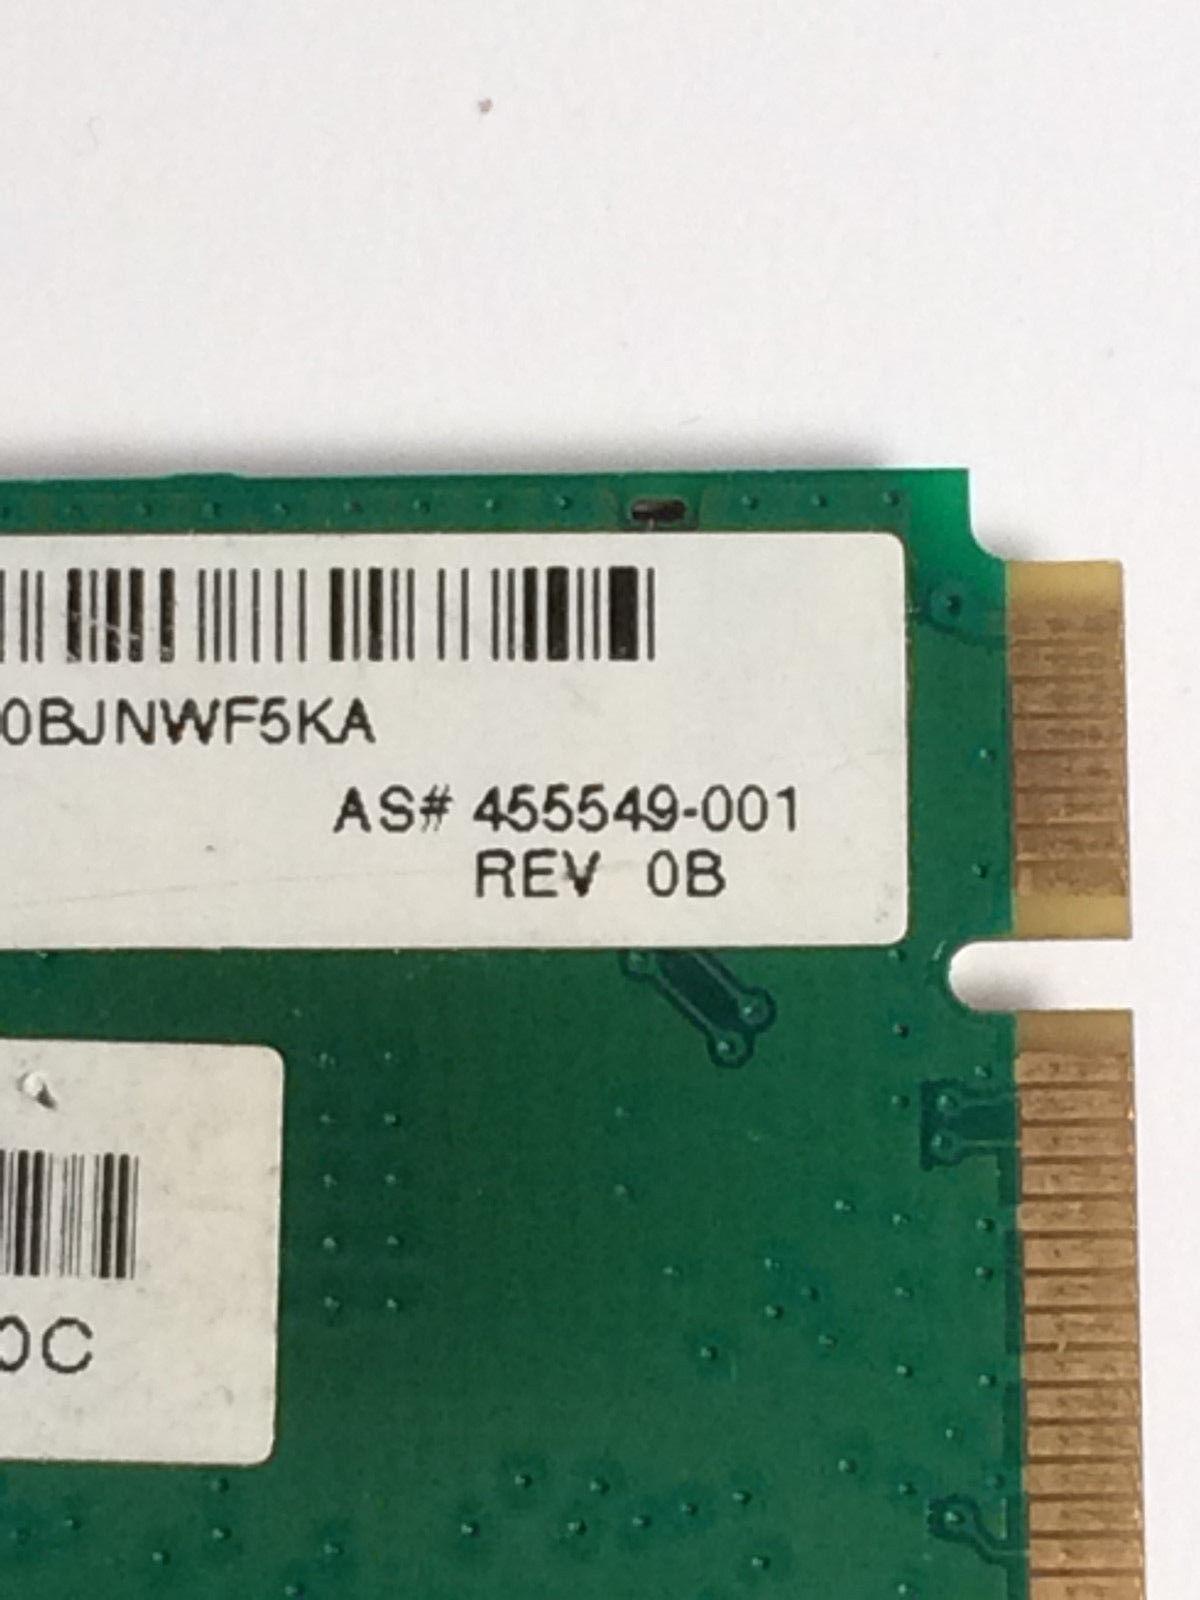 HP 459339-001 Pavilion dv6000 dv9000 g50 802.11b/g Mini PCI Wireless WI-FI Card image 6